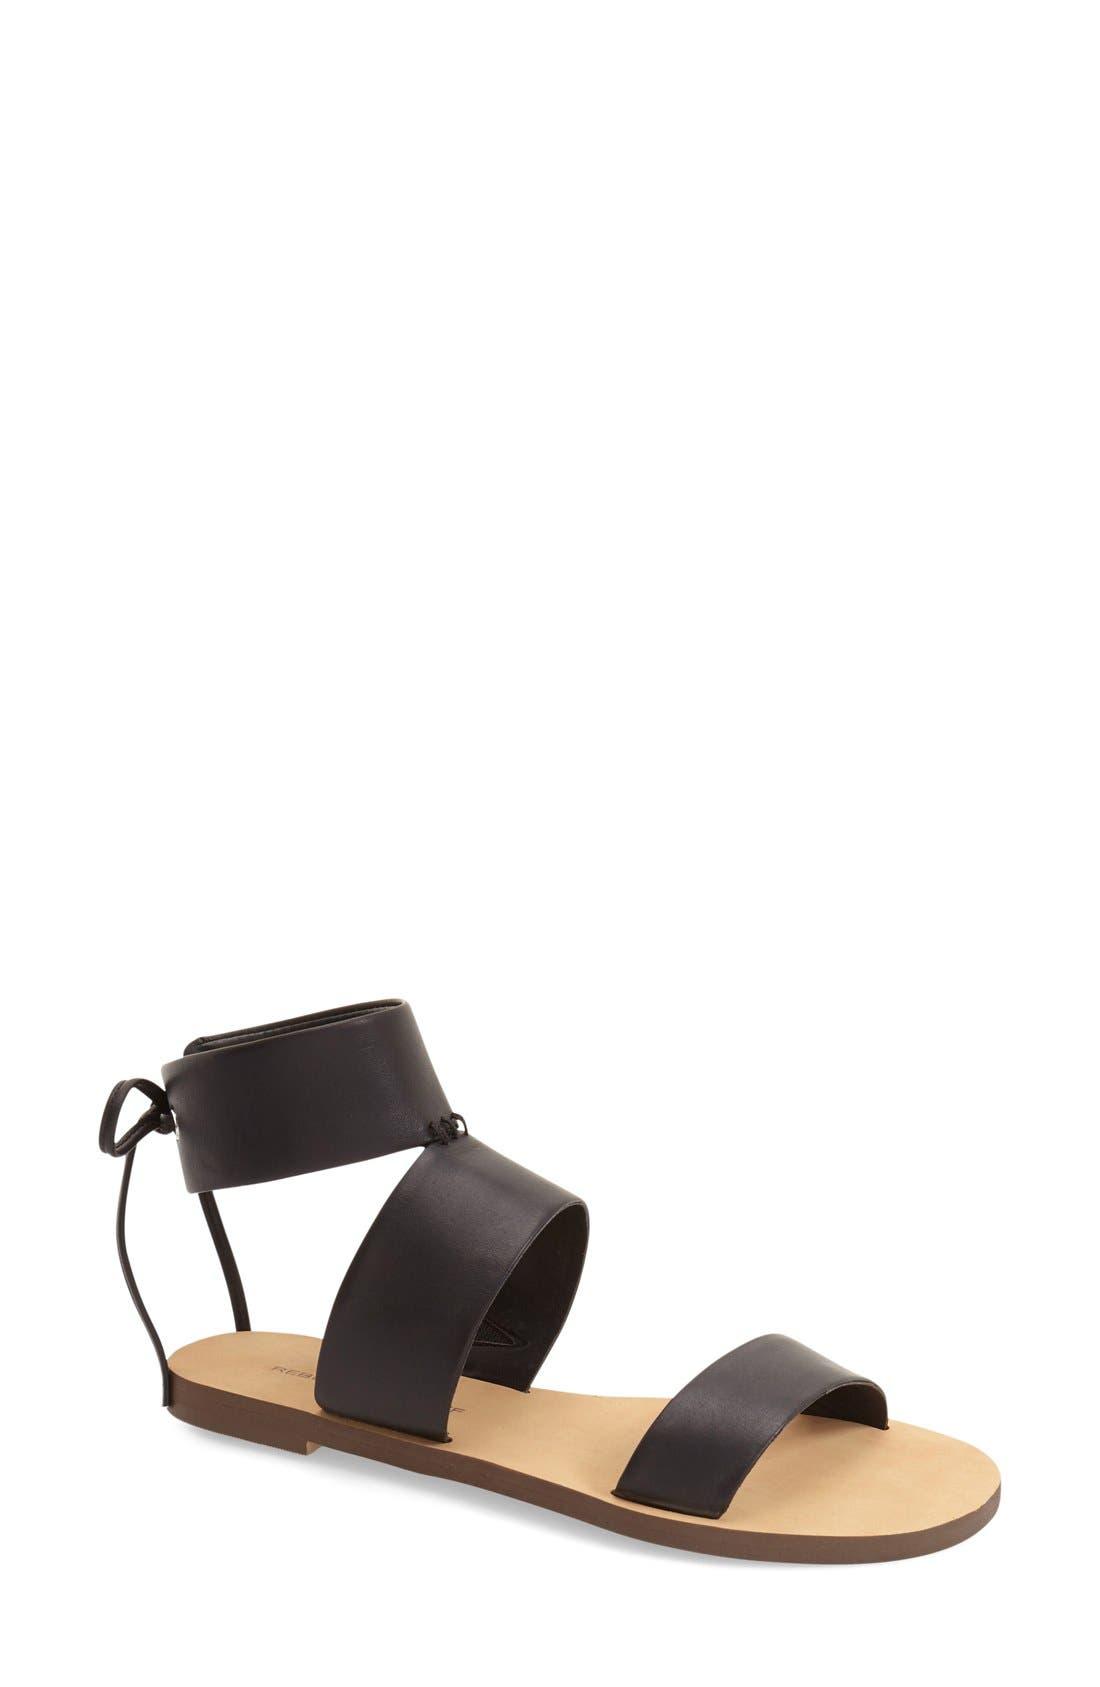 'Emma' Ankle Cuff Sandal,                         Main,                         color, 001